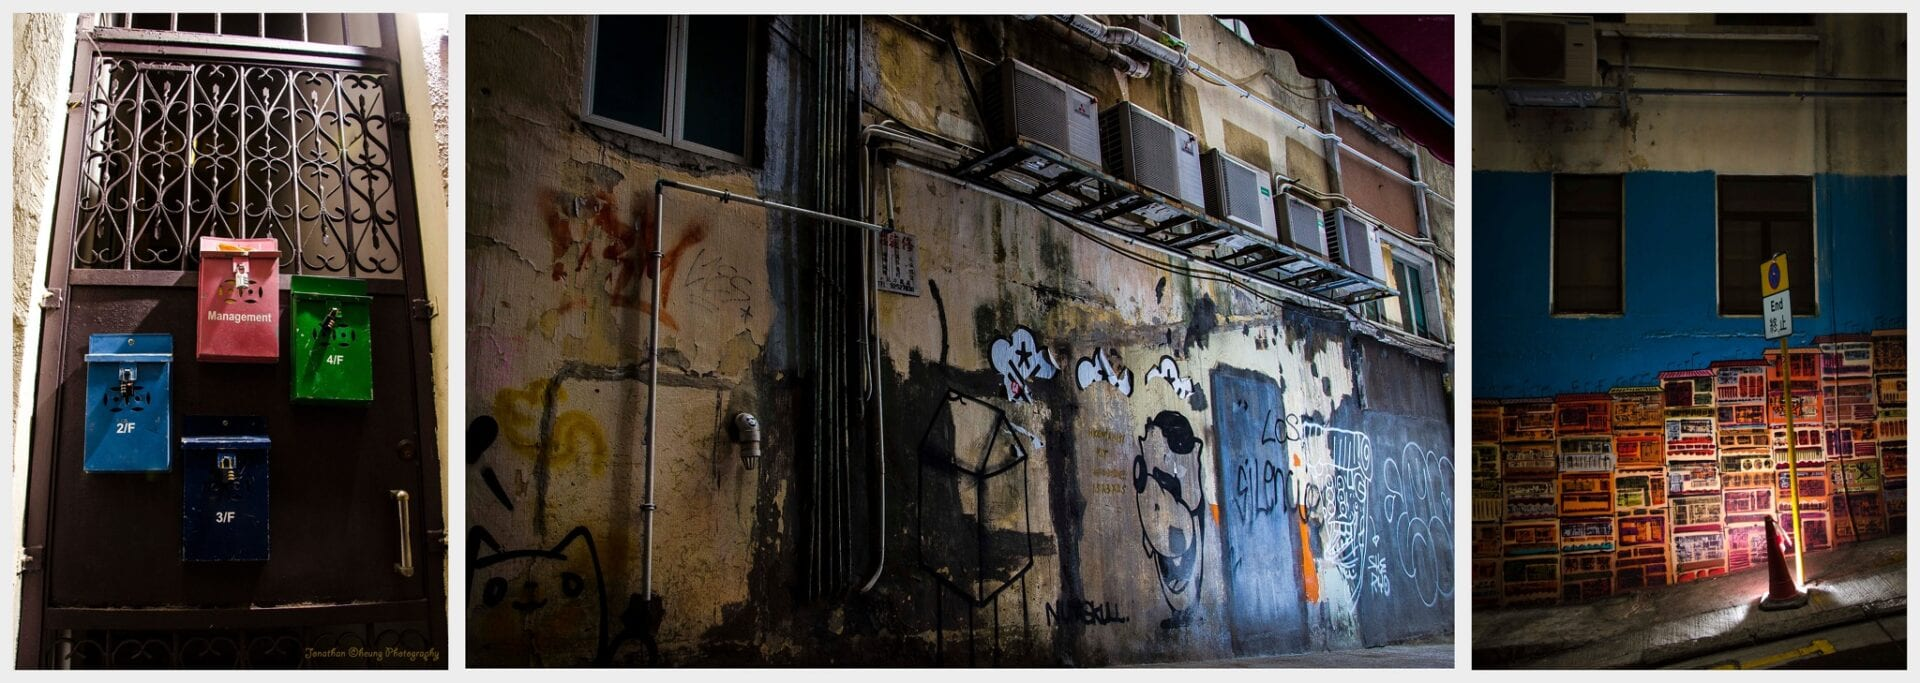 Edmonton-Street-photographer-Hong-kong--001